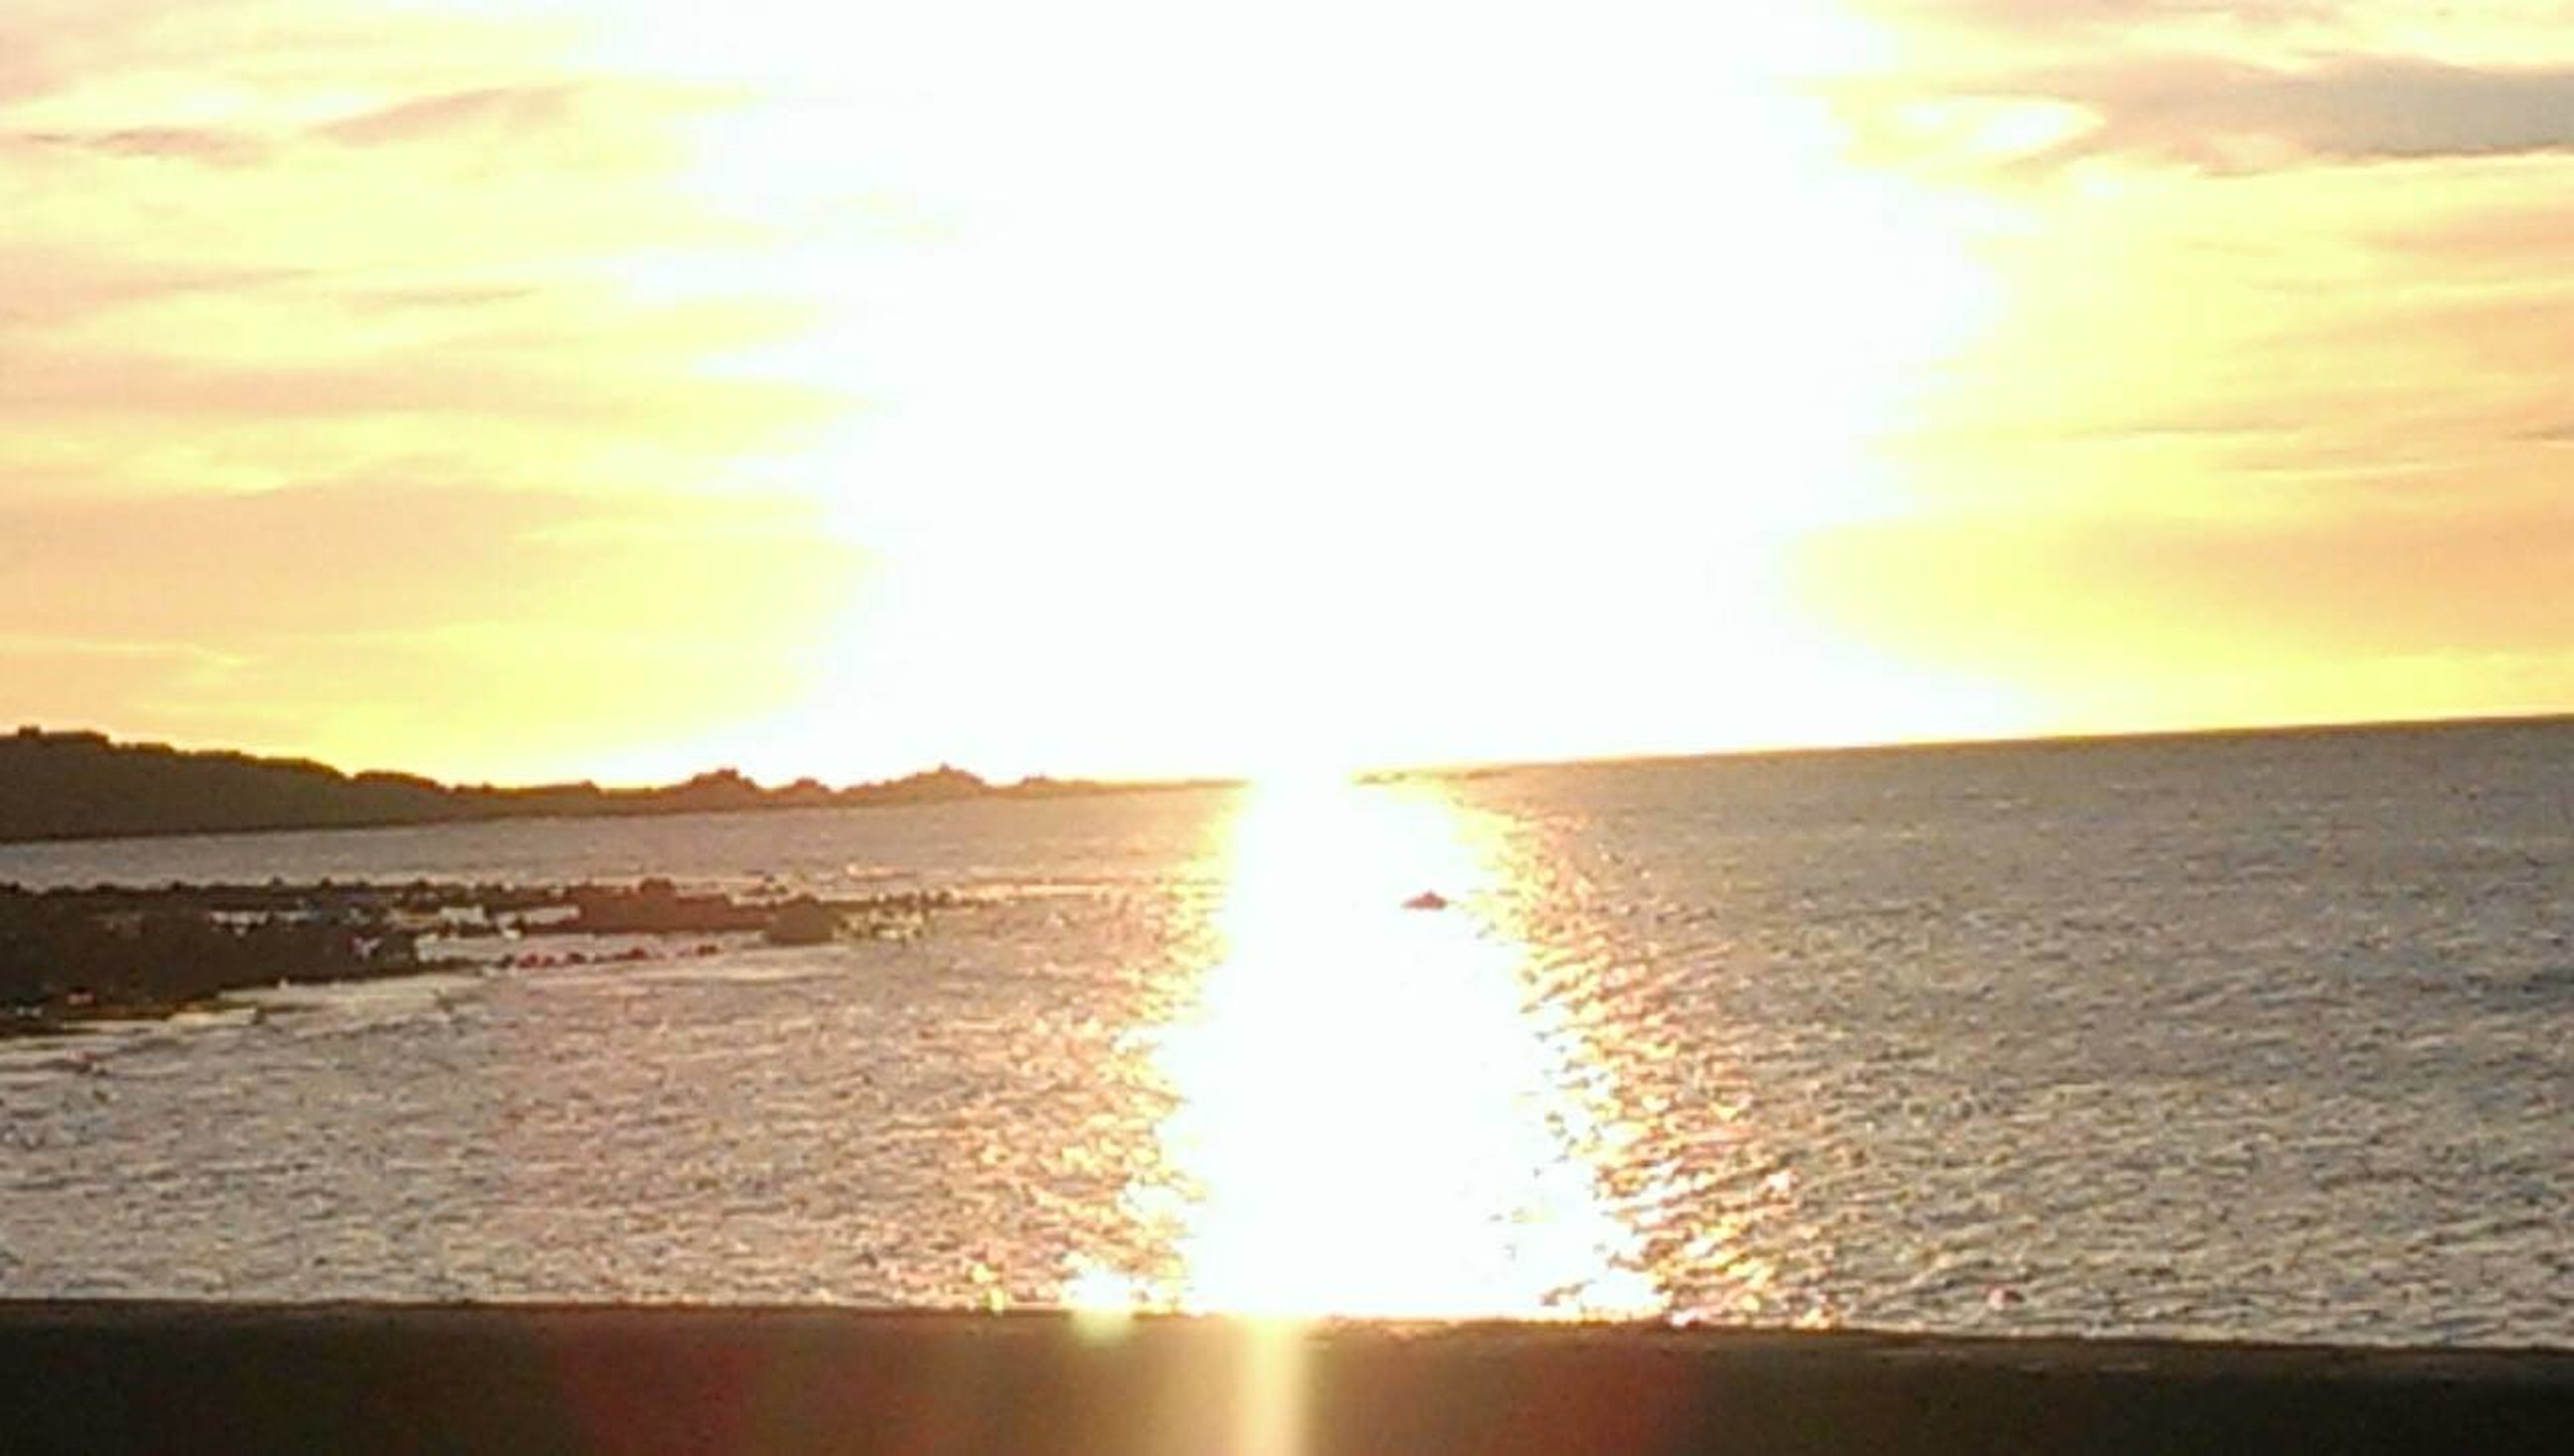 sun, sunset, water, reflection, scenics, tranquil scene, sea, sunlight, sunbeam, beauty in nature, sky, tranquility, lens flare, orange color, nature, idyllic, horizon over water, beach, cloud - sky, bright